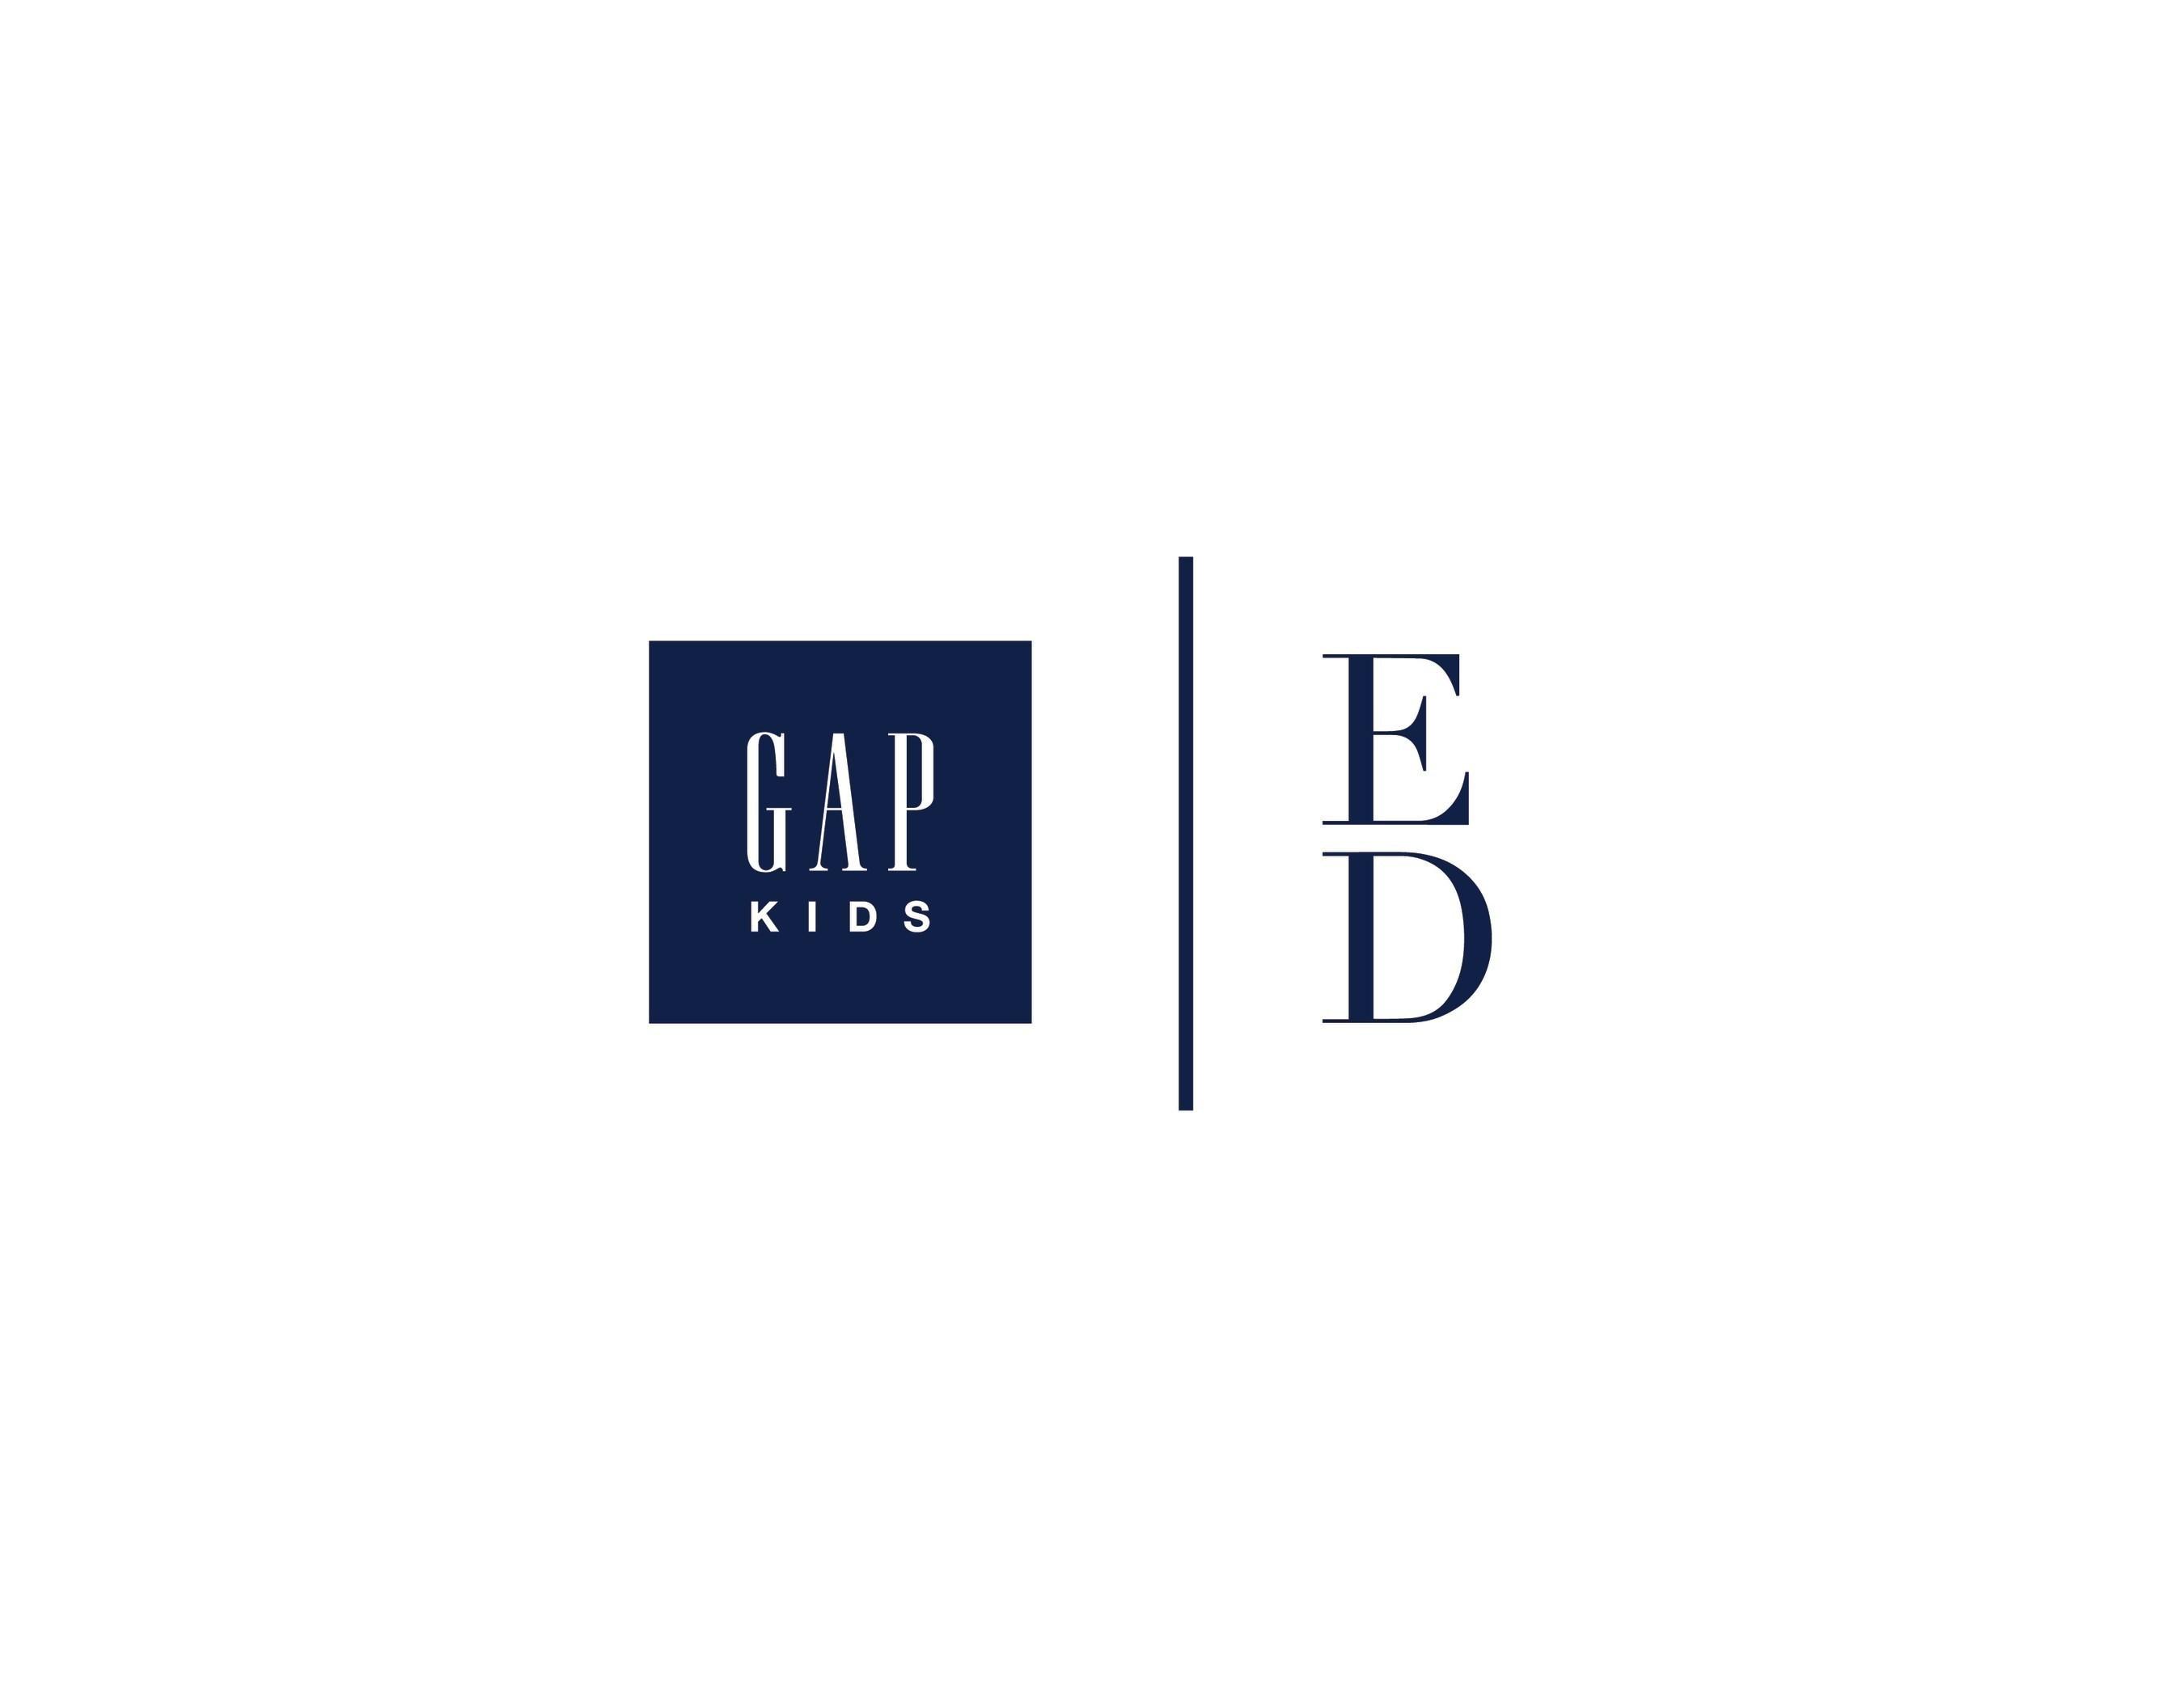 Gapkids Collaboration With Ellen Degeneres And Her Lifestyle Brand